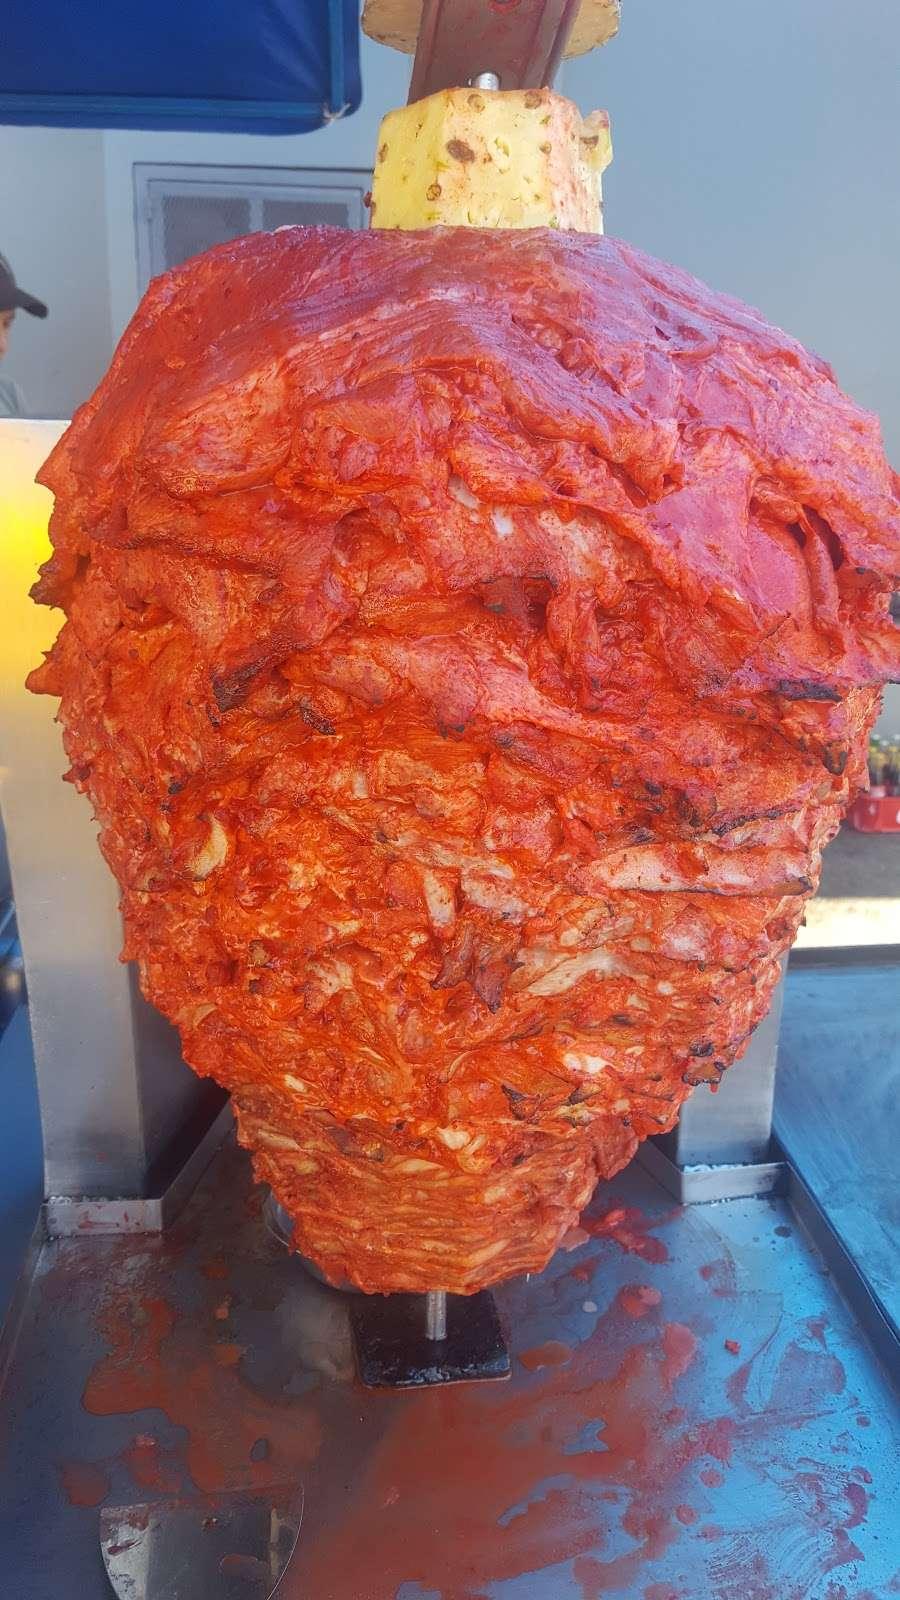 tacos noemi - restaurant    Photo 2 of 8   Address: Av. Ignacio Allende 7096, Azcona, 22100 Tijuana, B.C., Mexico